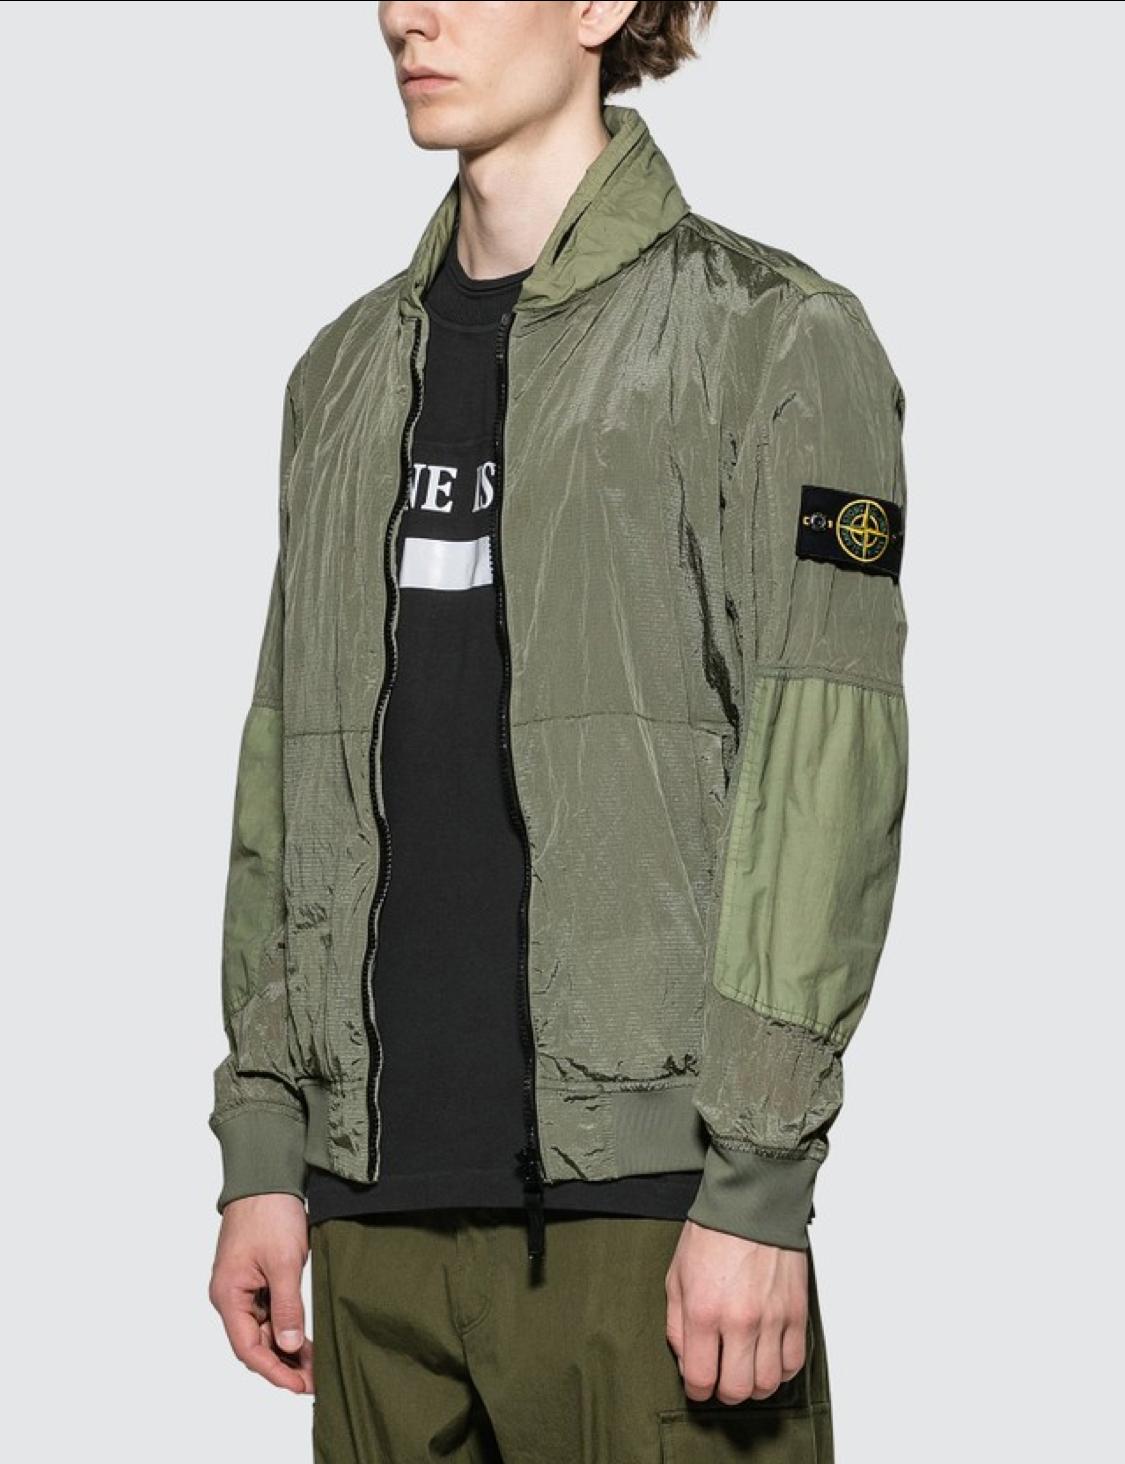 △ STONE ISLAND 2-Way Nylon Metal Watro Ripstop Jacket  HK$5,142